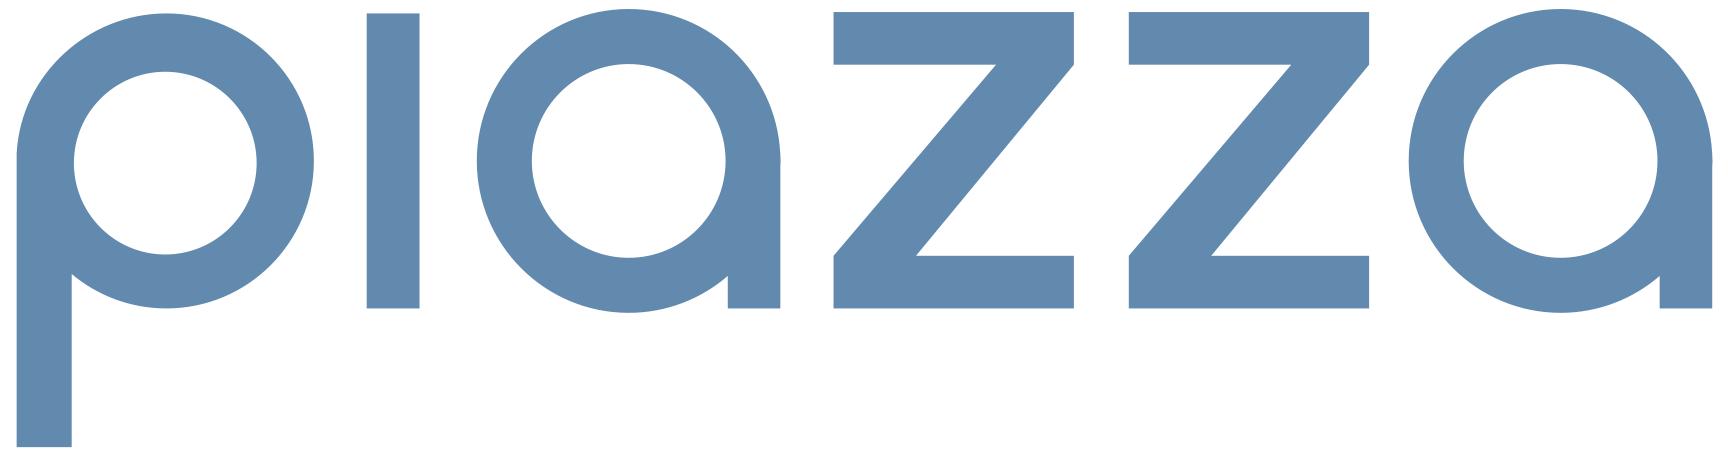 Image result for piazza.com website